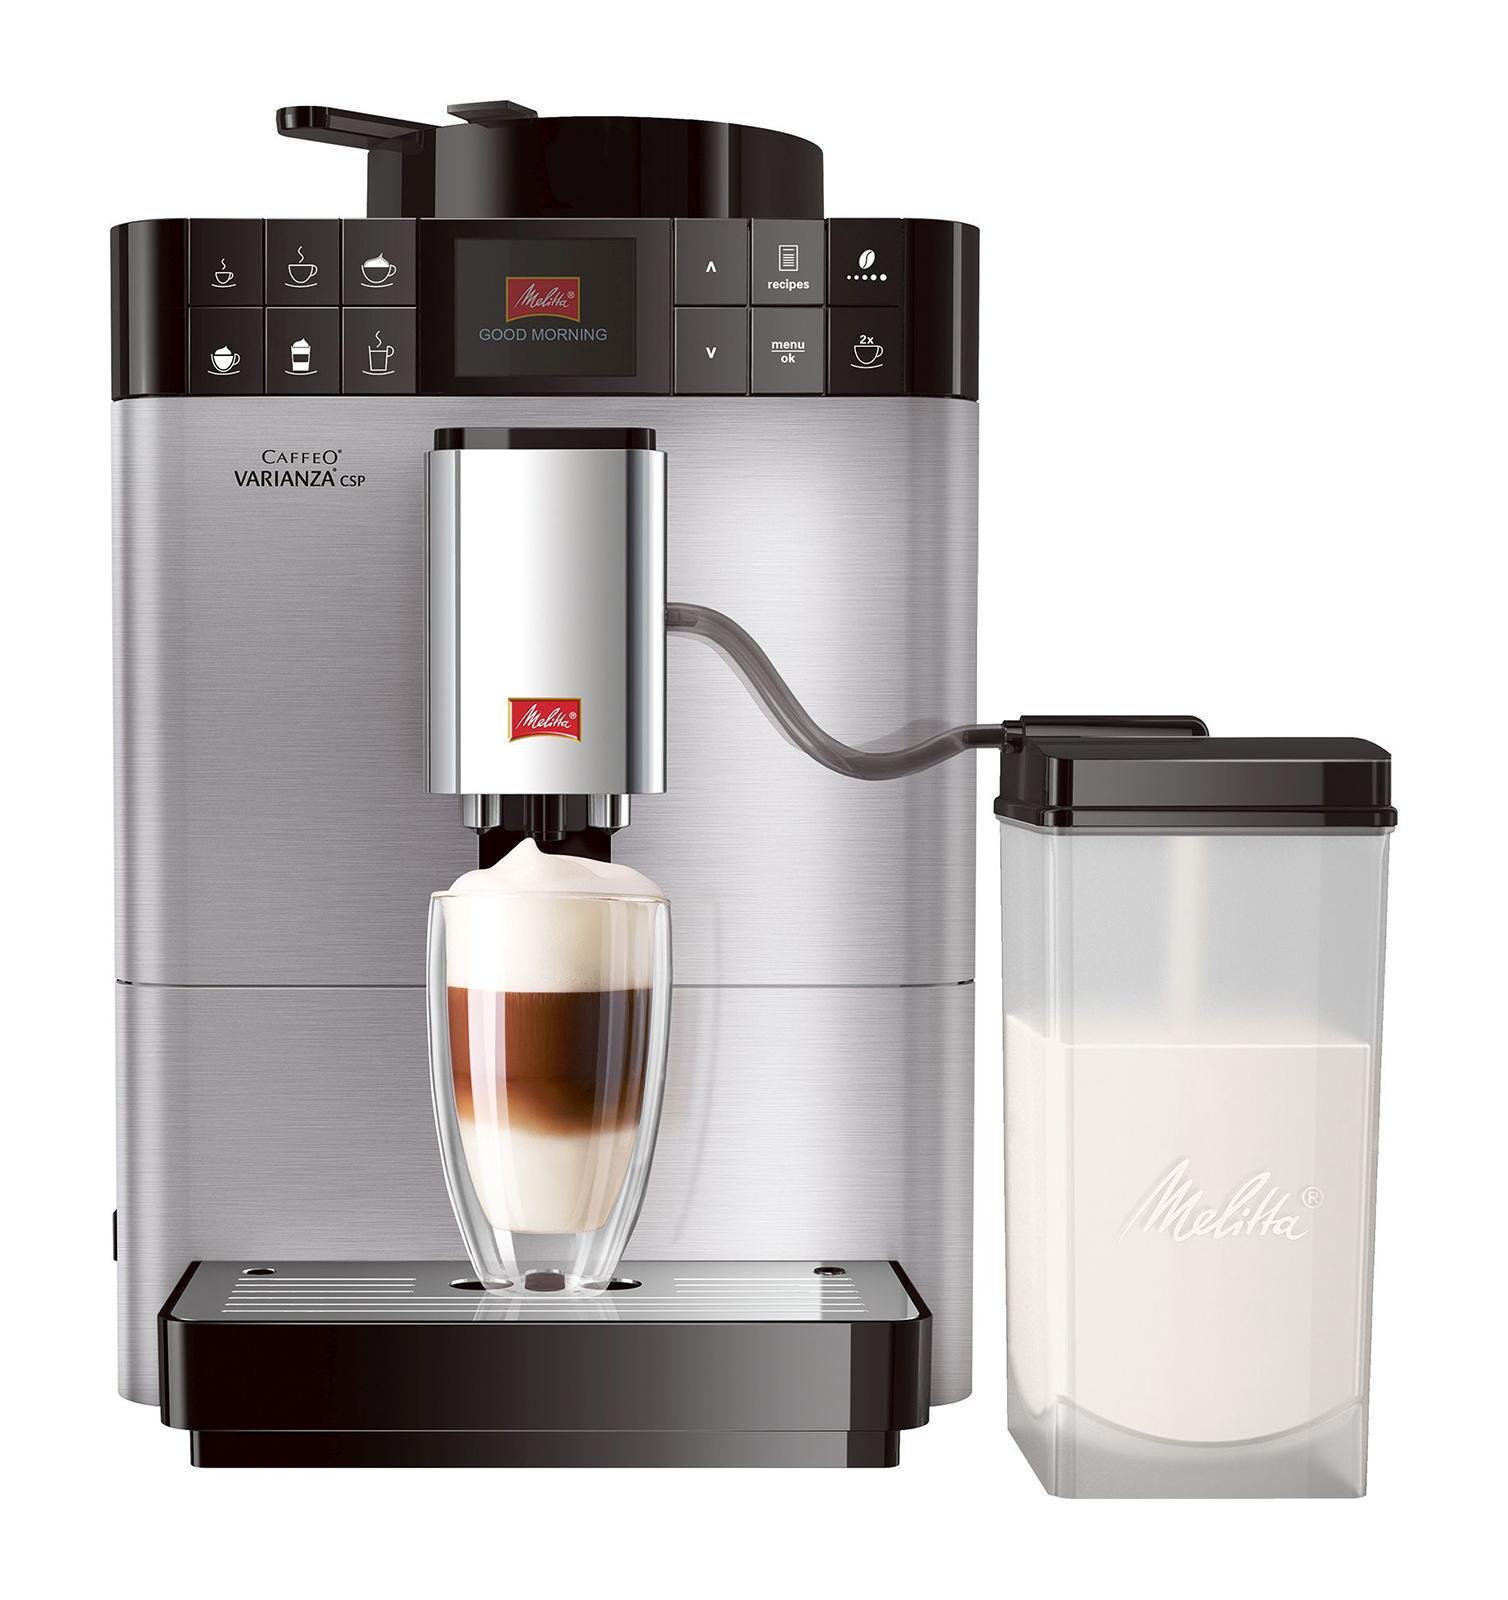 Melitta Caffeo F 570-101 Varianza CSP, Silver кофемашина